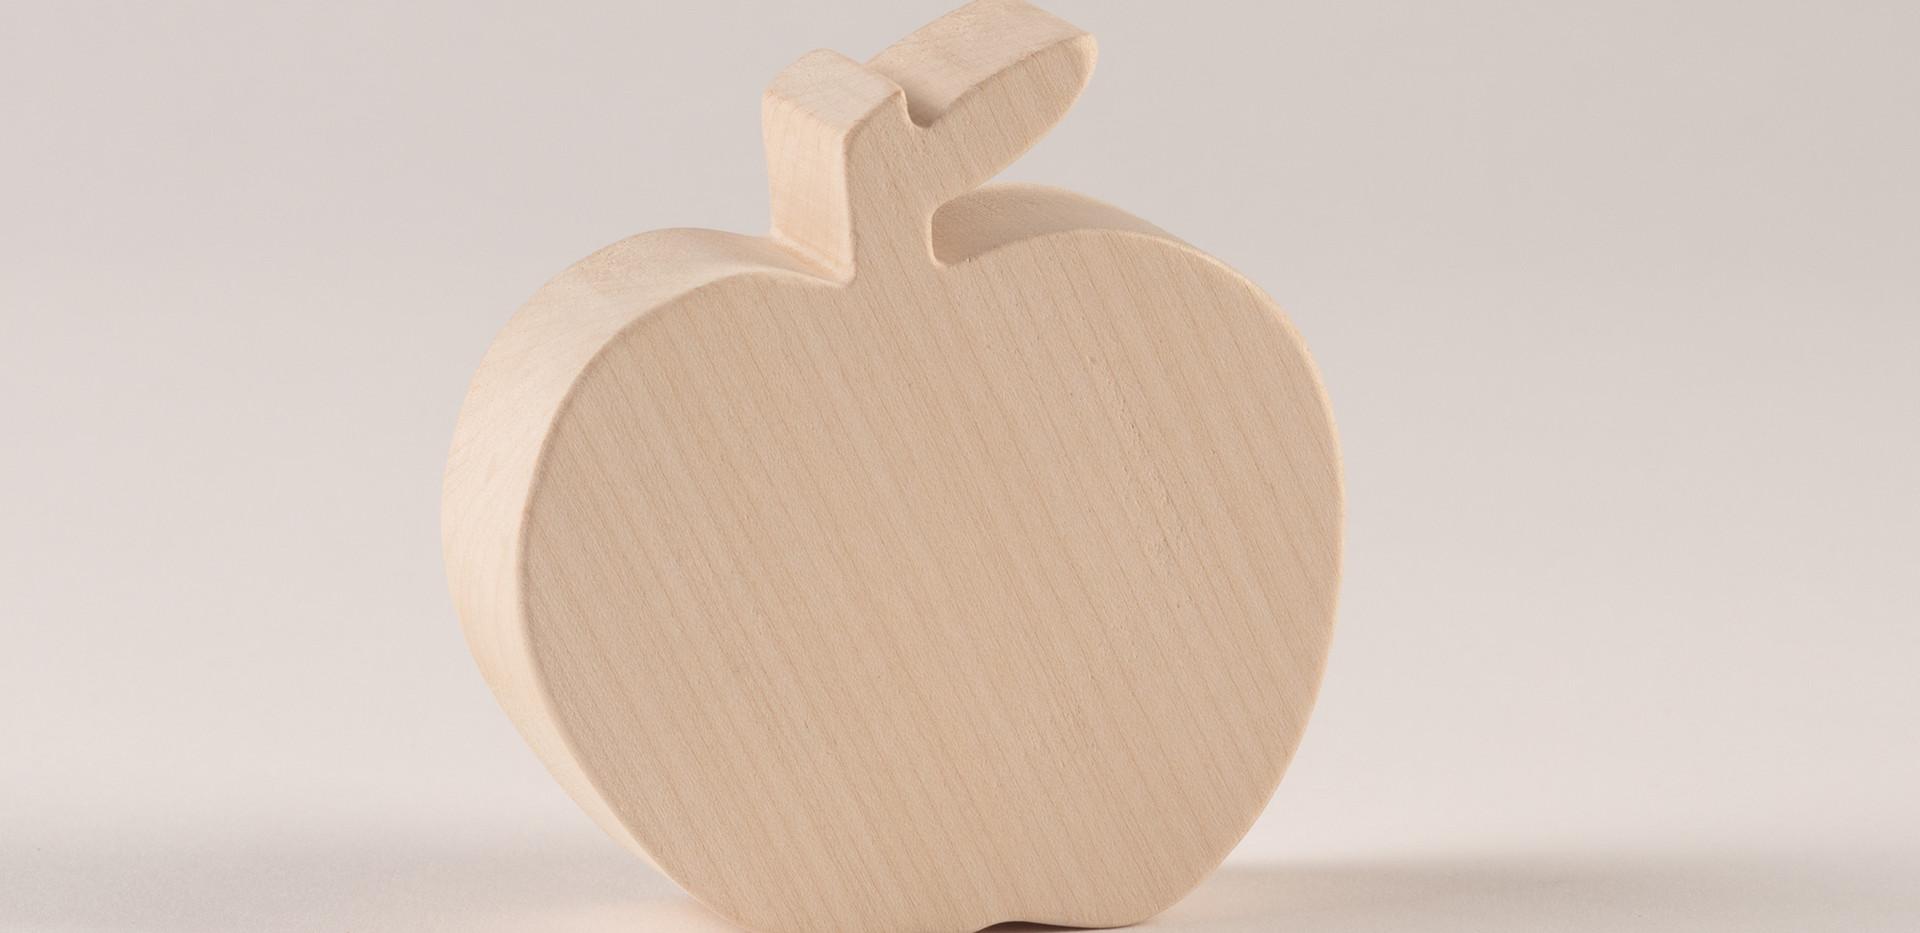 Holzspielzeug 14.jpg